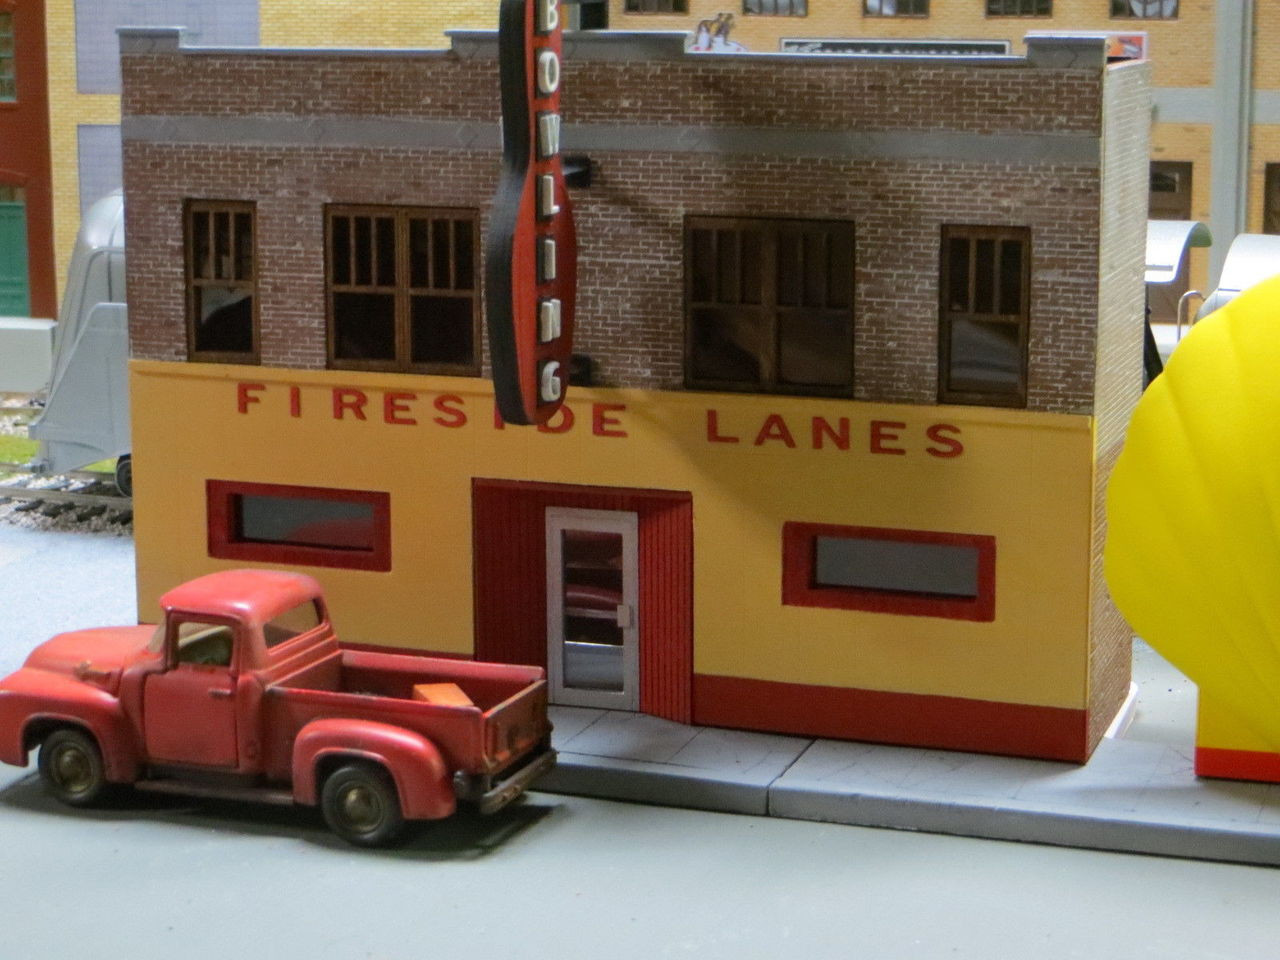 48-7000 1/48 O Scale Fireside Lanes Bowling Alley building Kit Resin ART DECO Best Brick